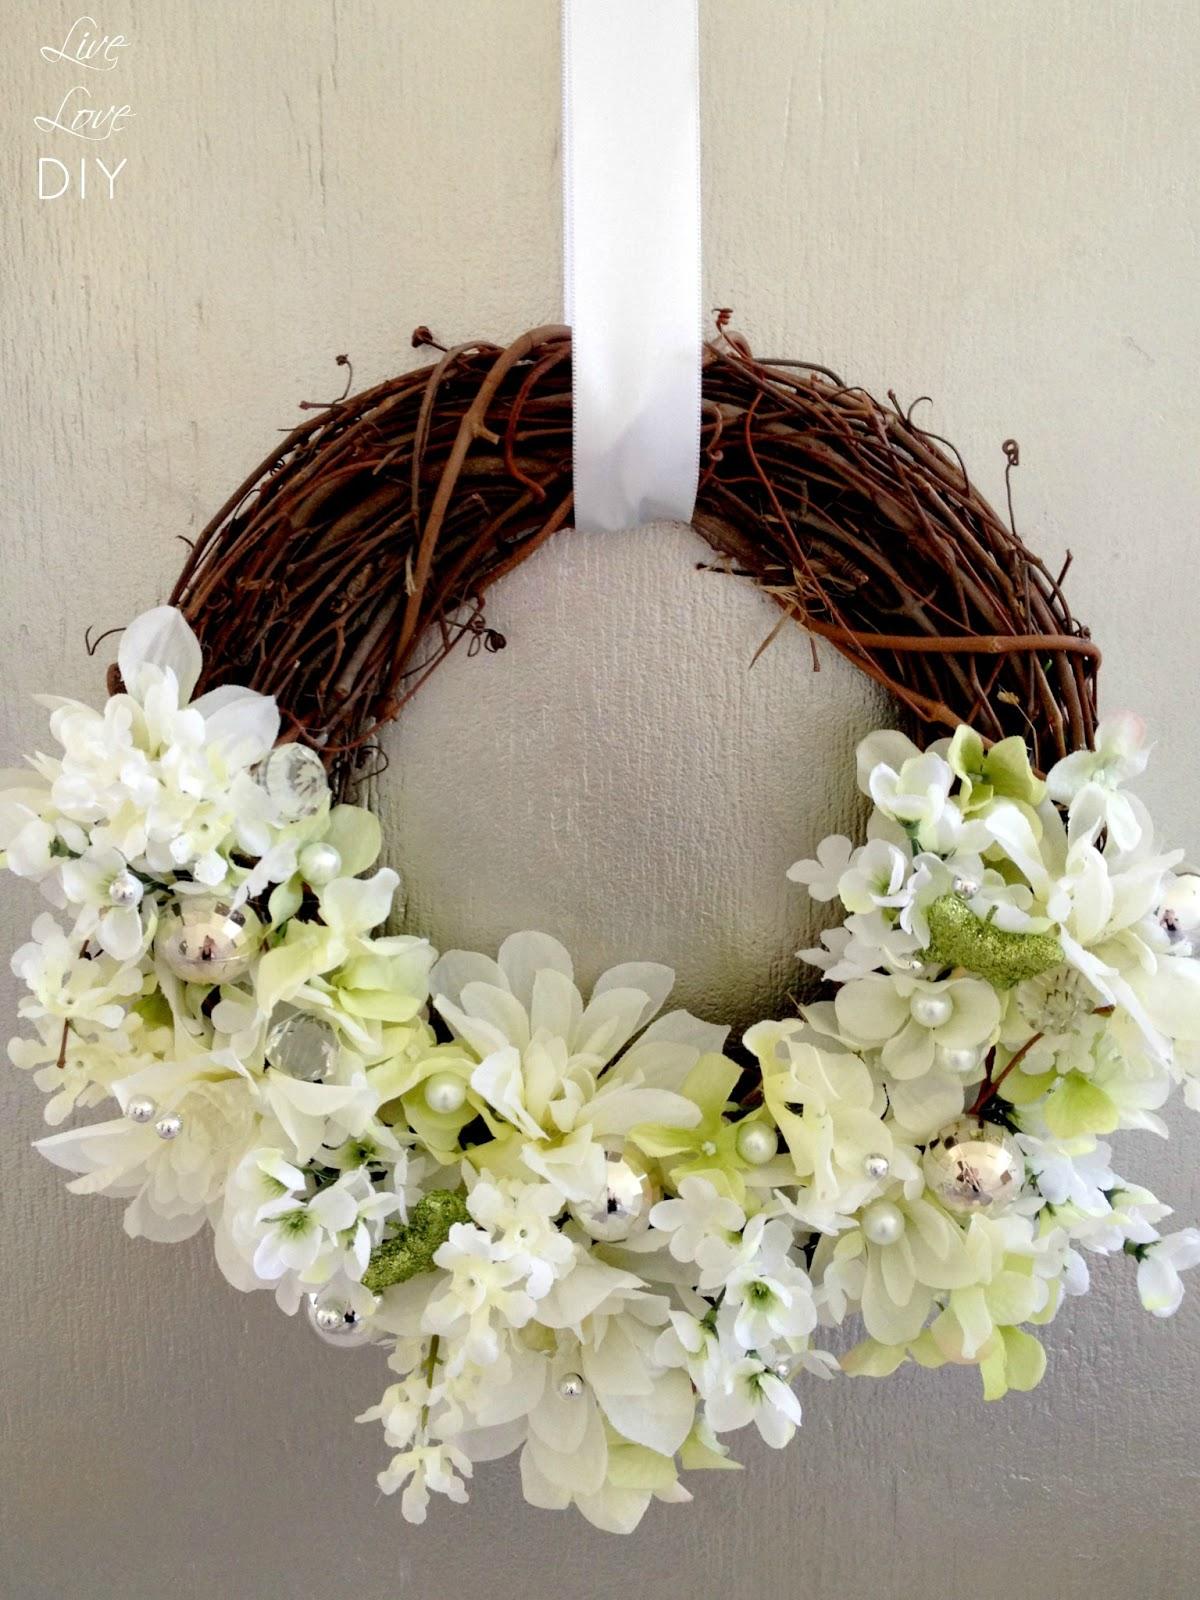 LiveLoveDIY DIY Flower Wreath